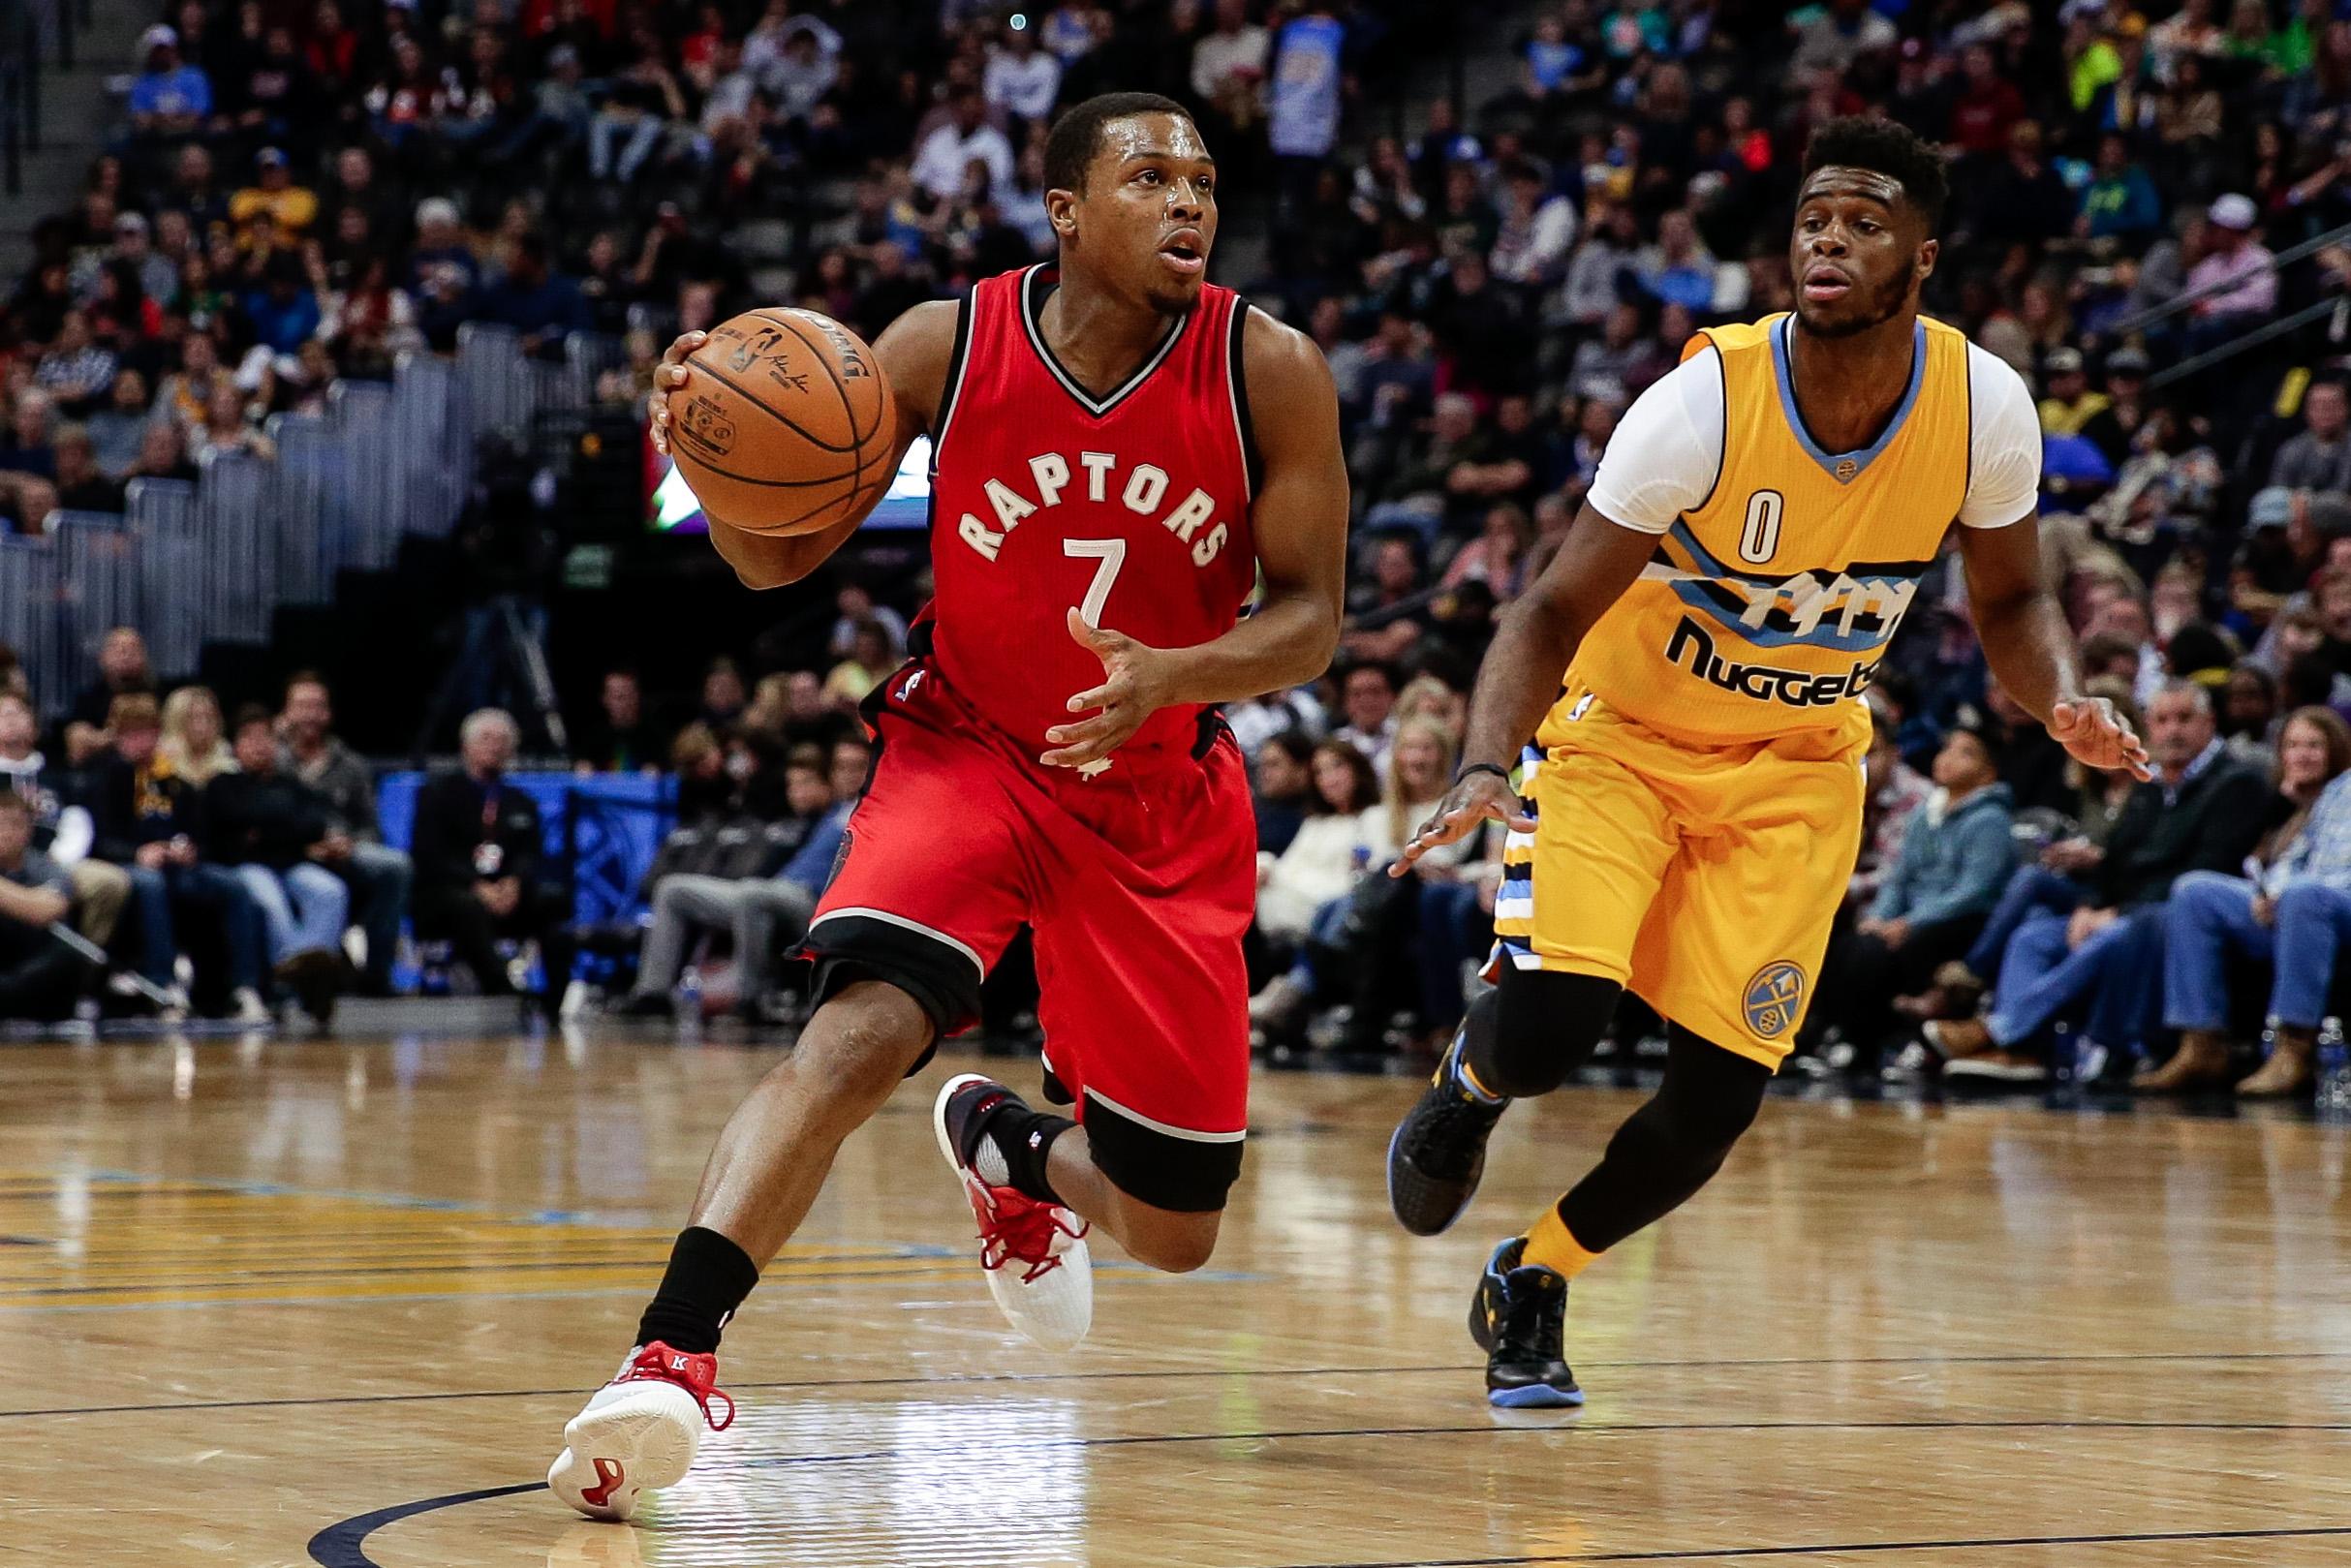 Toronto Raptors: Toronto Raptors 2016-17 Player Grades: The Starters